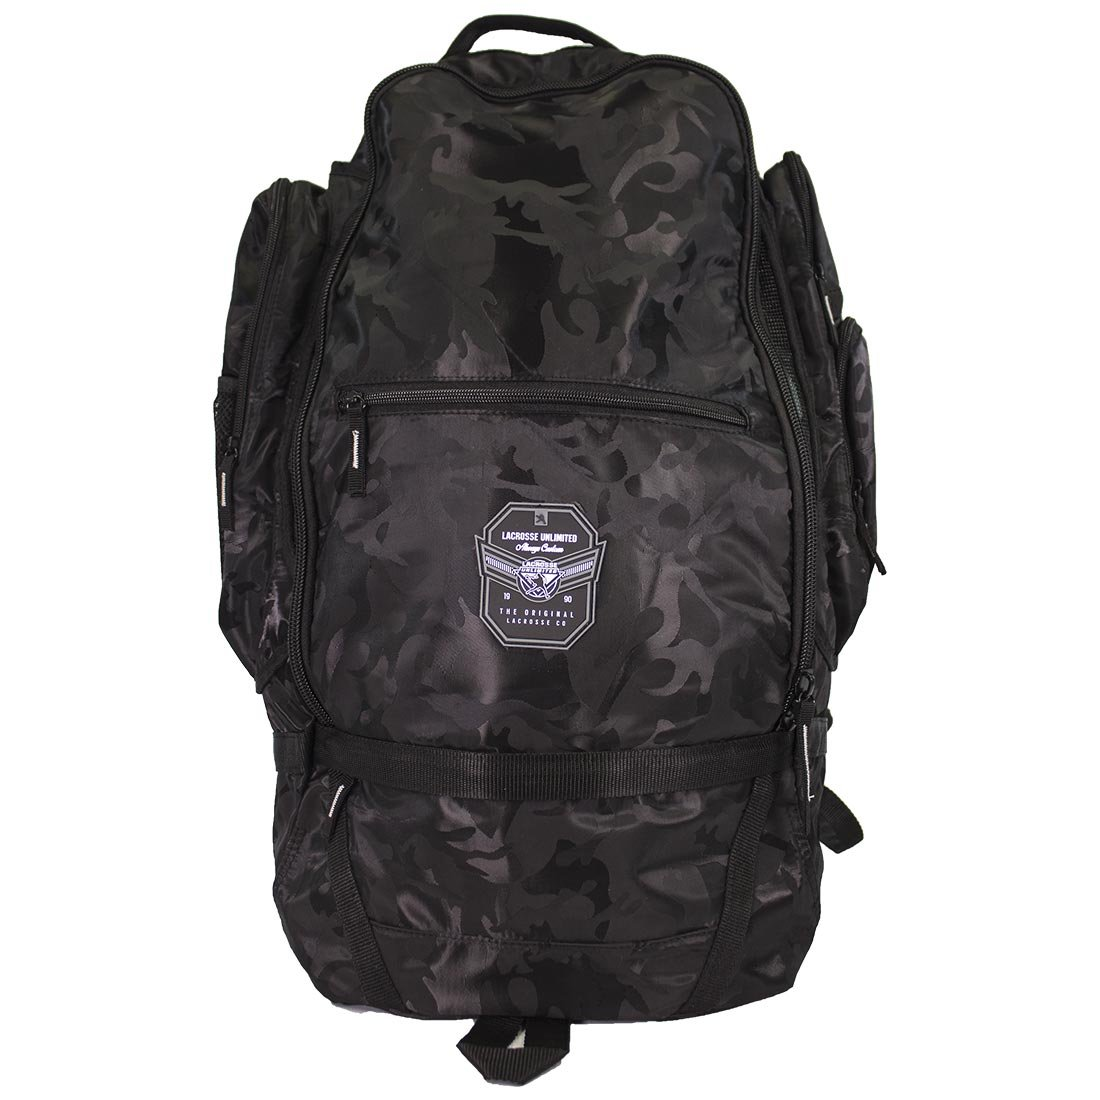 Lacrosse Unlimited Overtime Backpack - Black Camo